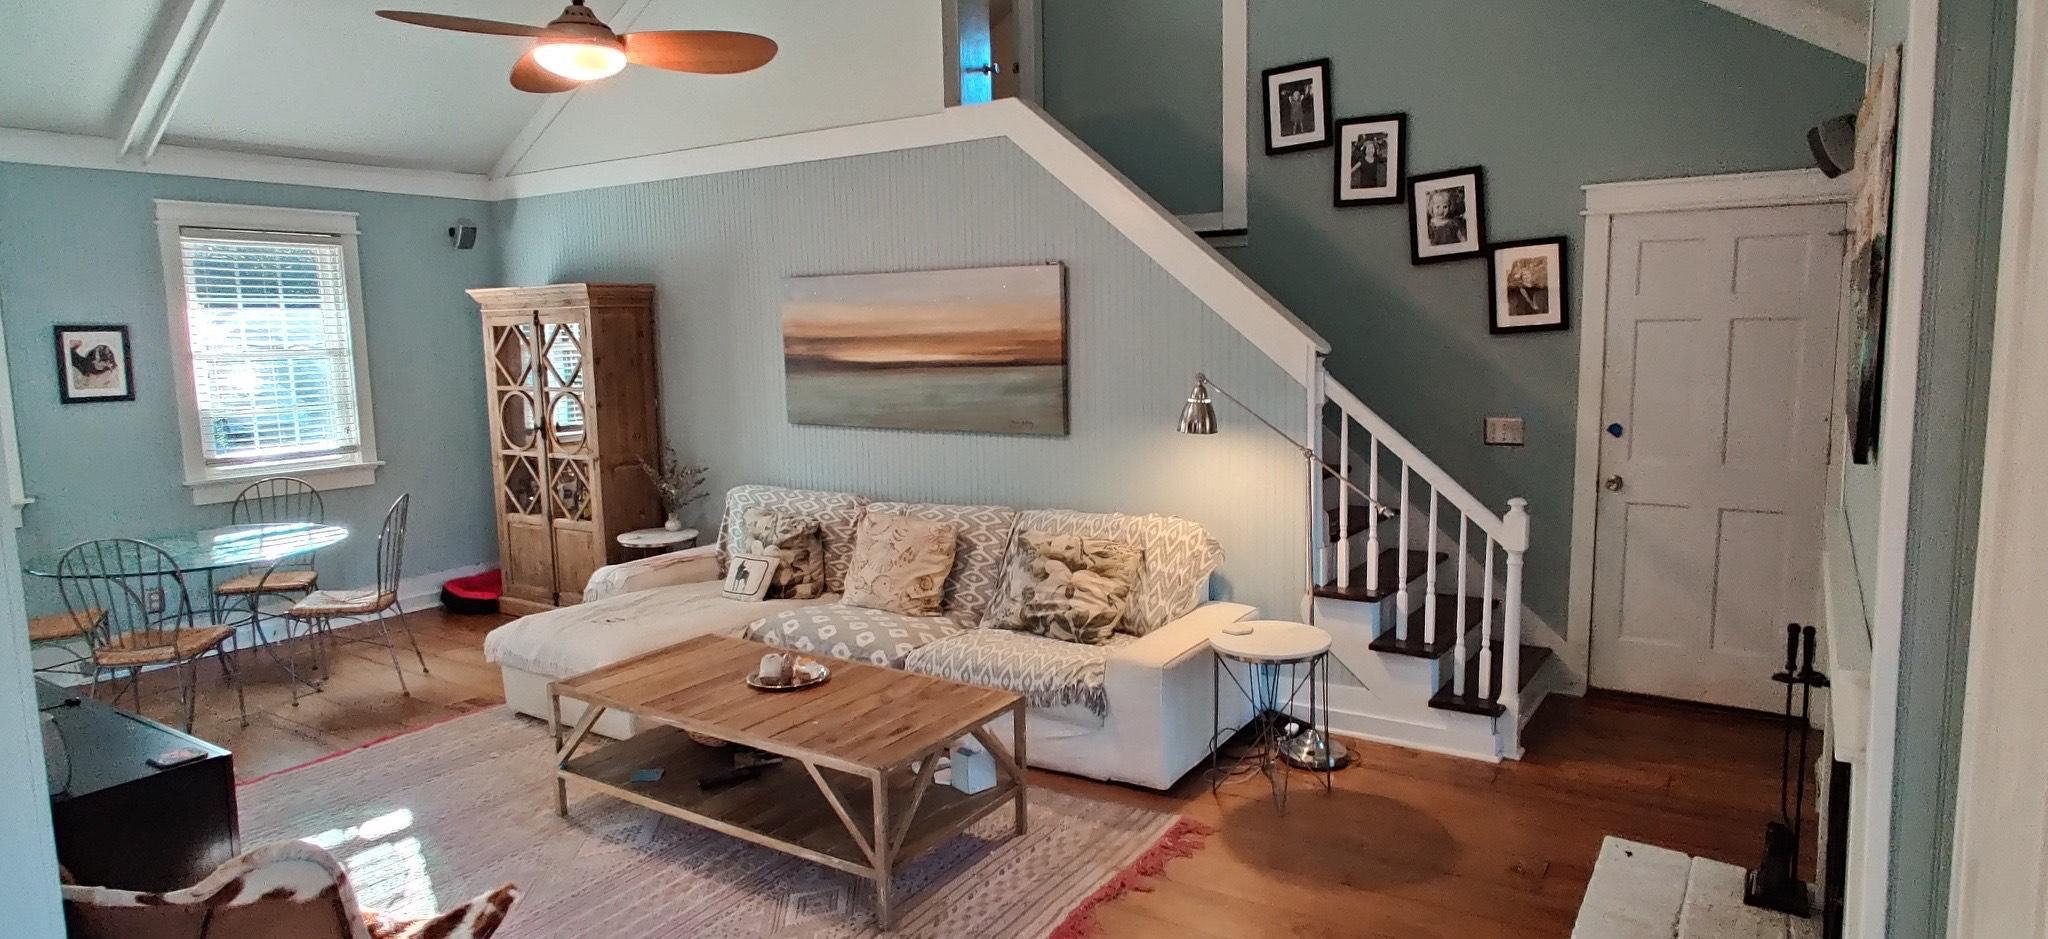 Shemwood II Homes For Sale - 950 Sea Gull, Mount Pleasant, SC - 9